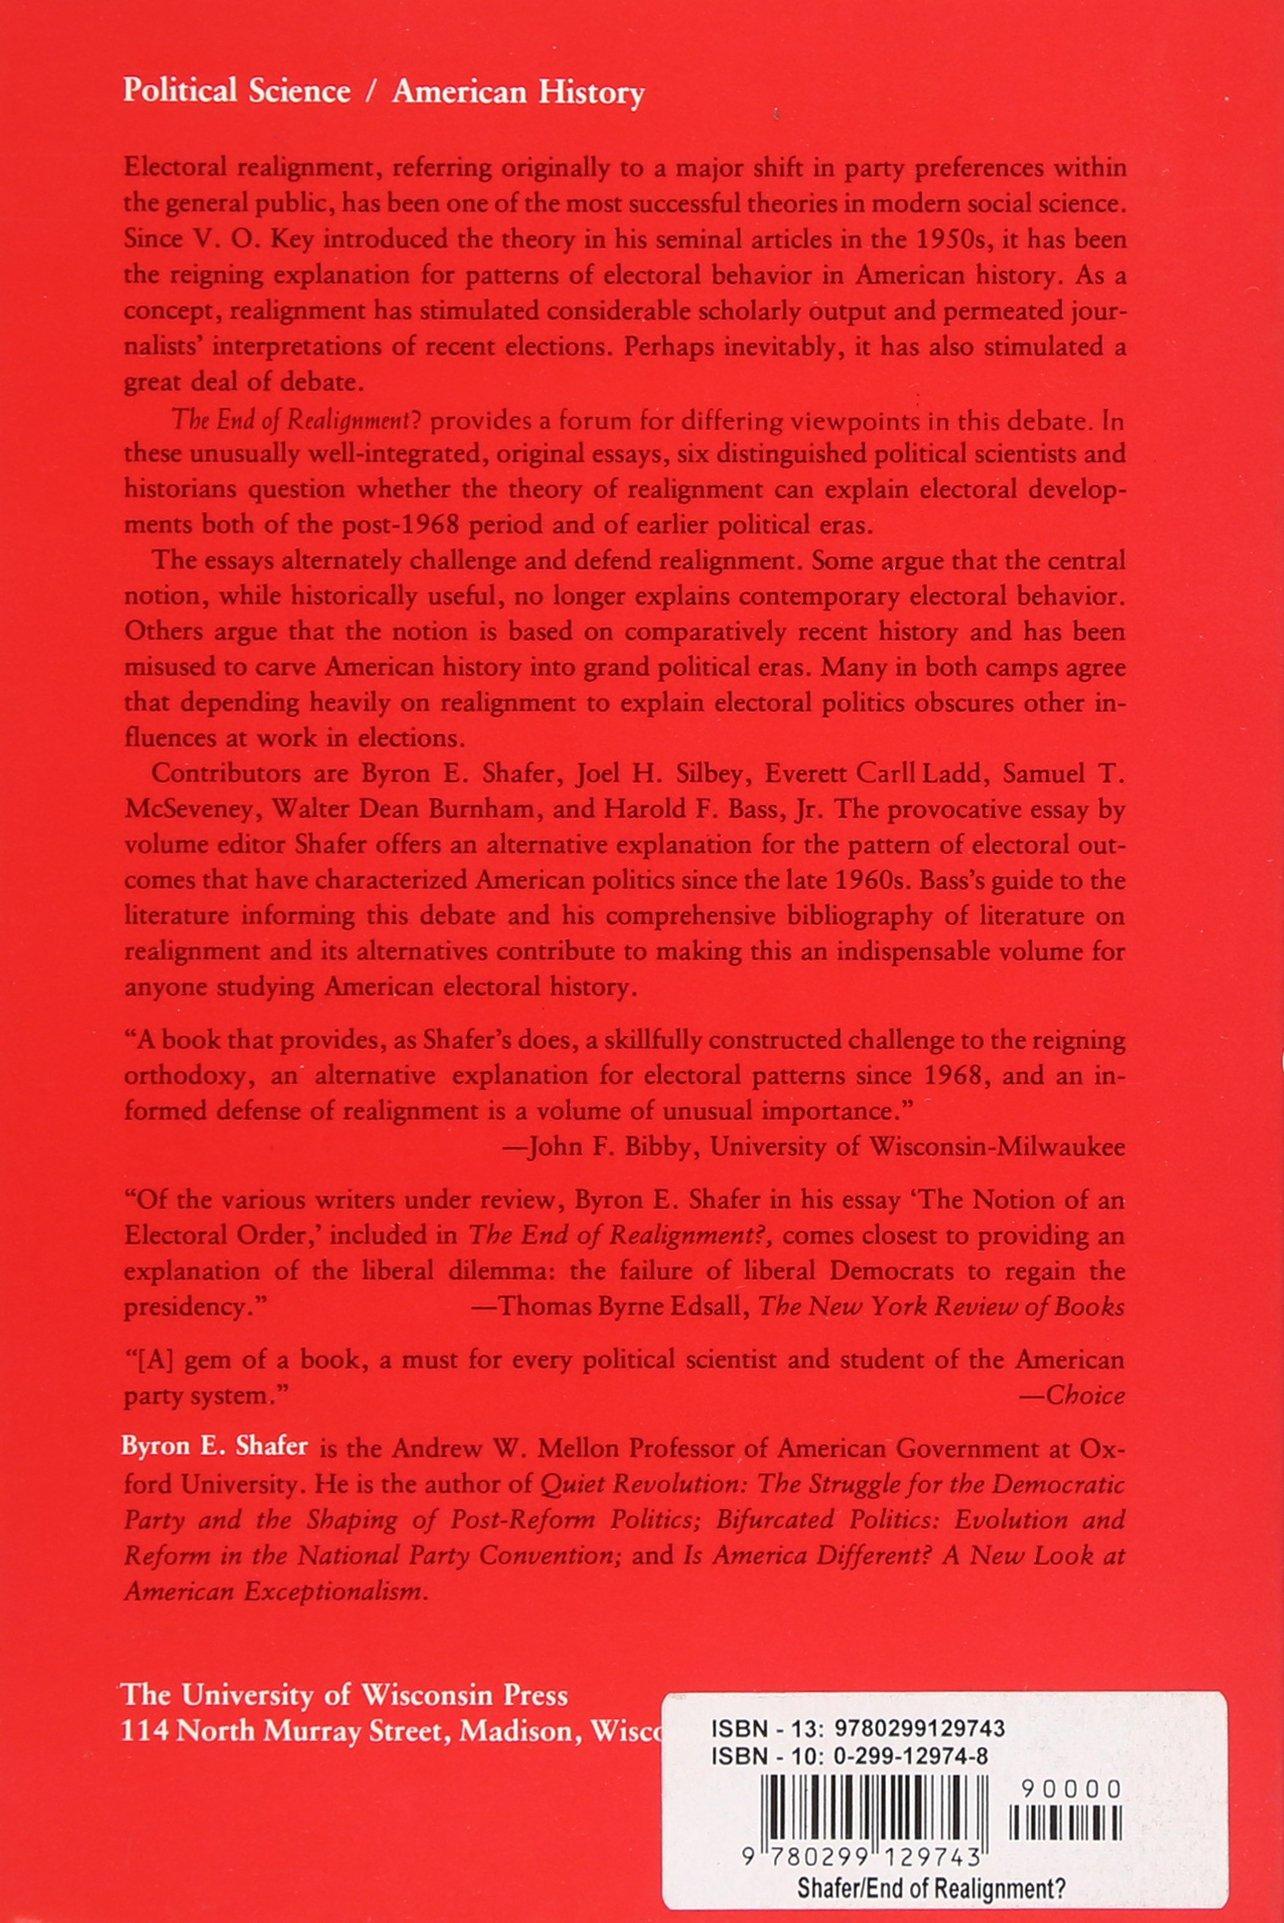 The End Of Realignment?: Interpreting American Electoral Eras: Byron E  Shafer: 9780299129743: Amazon: Books